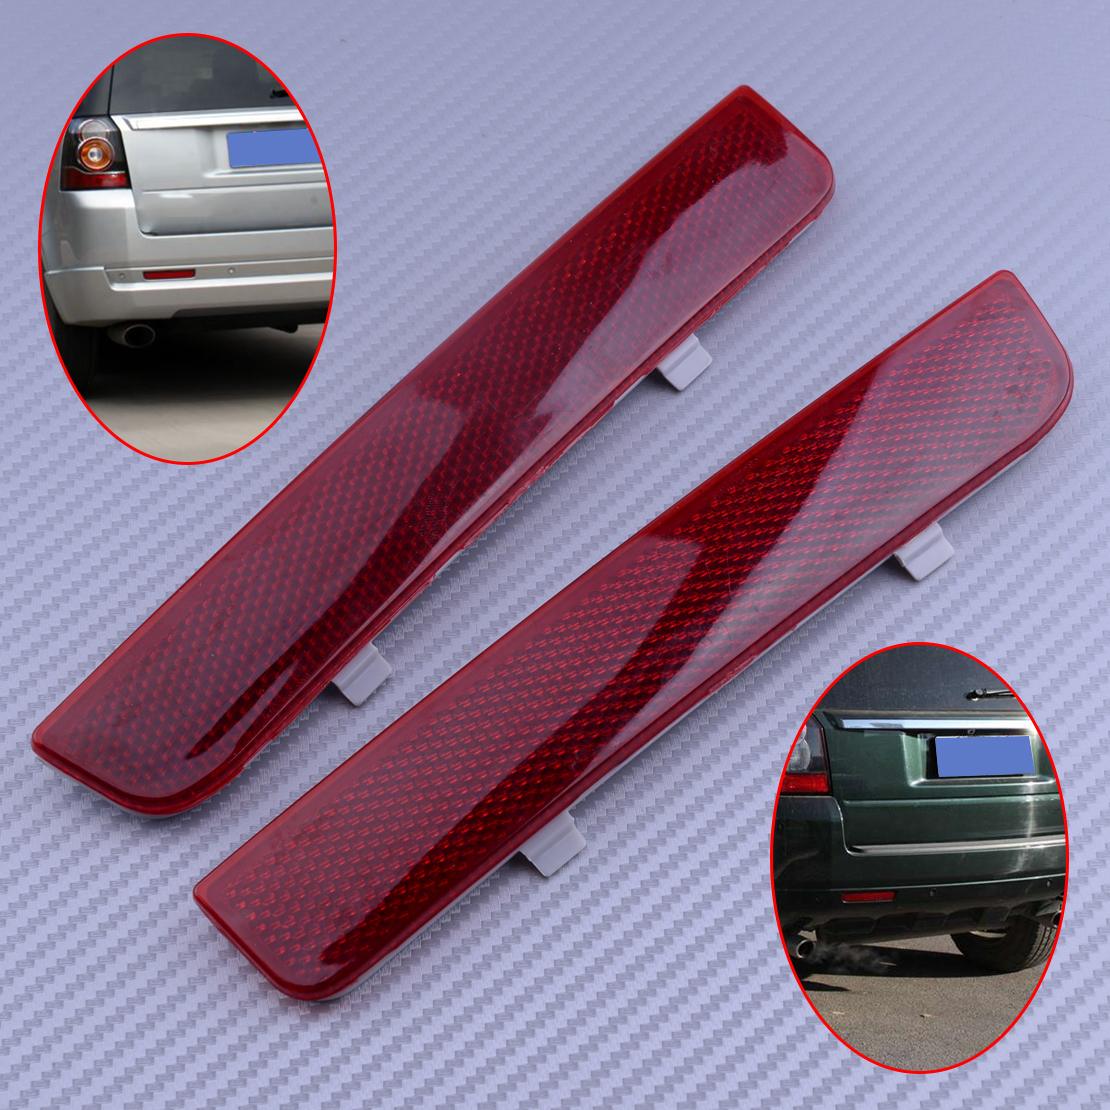 2010 Land Rover Lr2 Exterior: Beler 1 Pair Rear LH RH Bumper Red Reflector Fit For Land